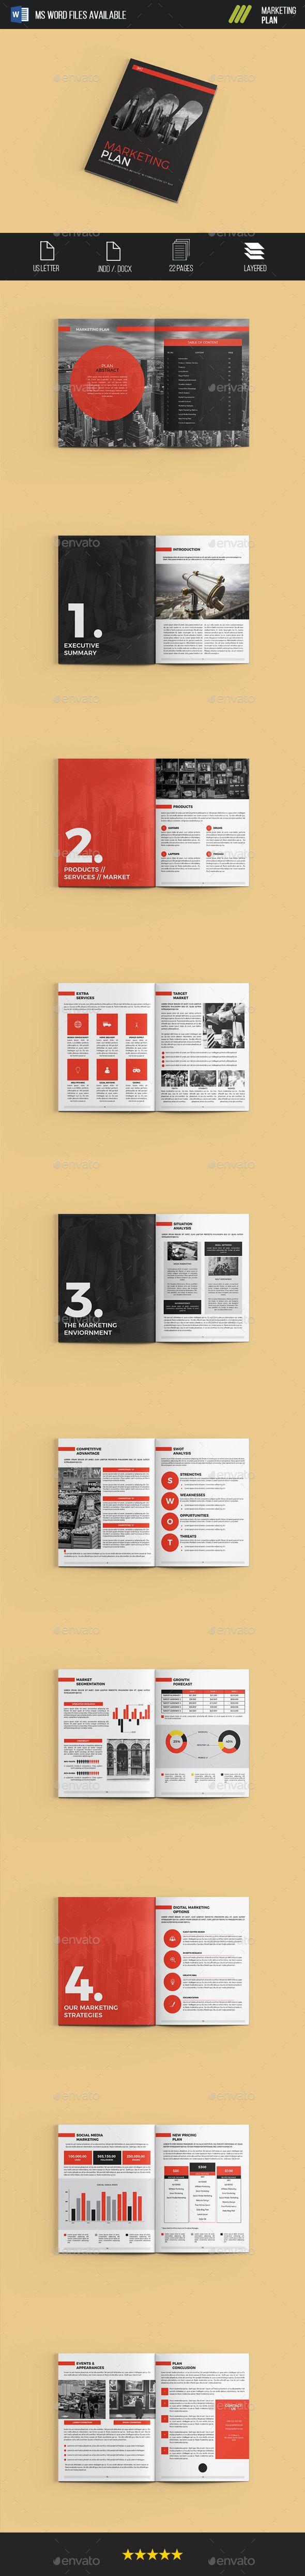 Marketing Plan Brochure Template InDesign INDD | Maquetacion ...